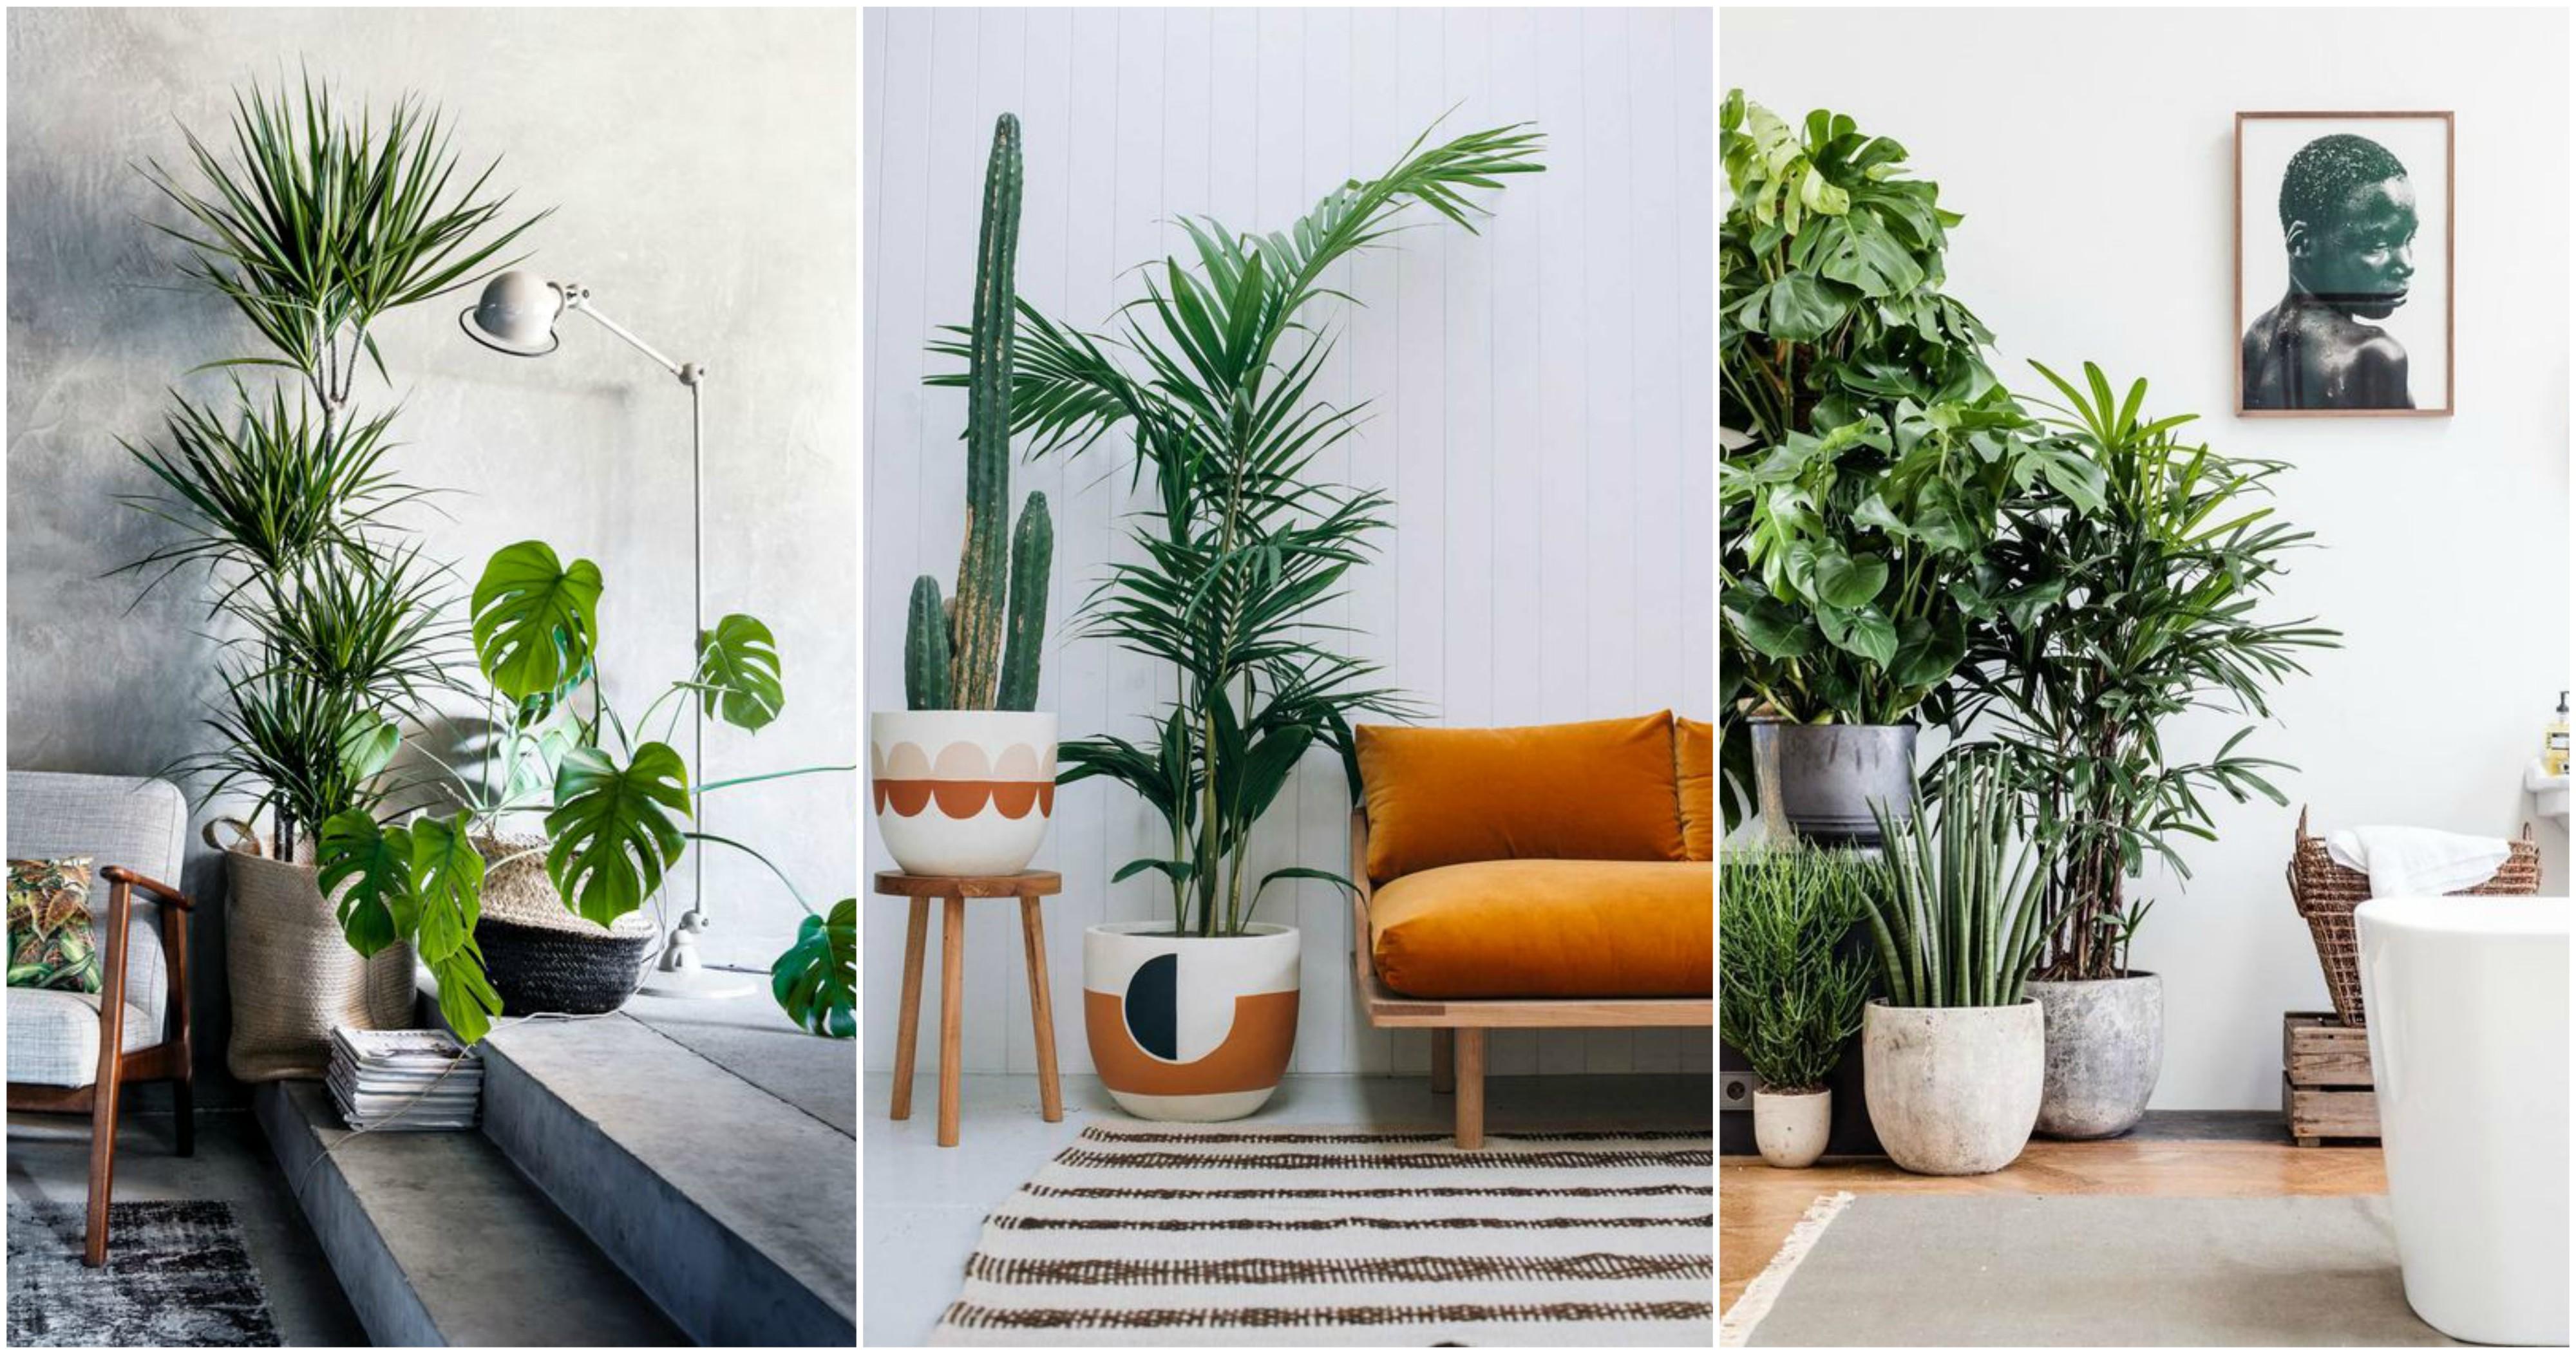 5x kamerplanten die weinig water nodig hebben homedeal nl for Grote kamerplanten